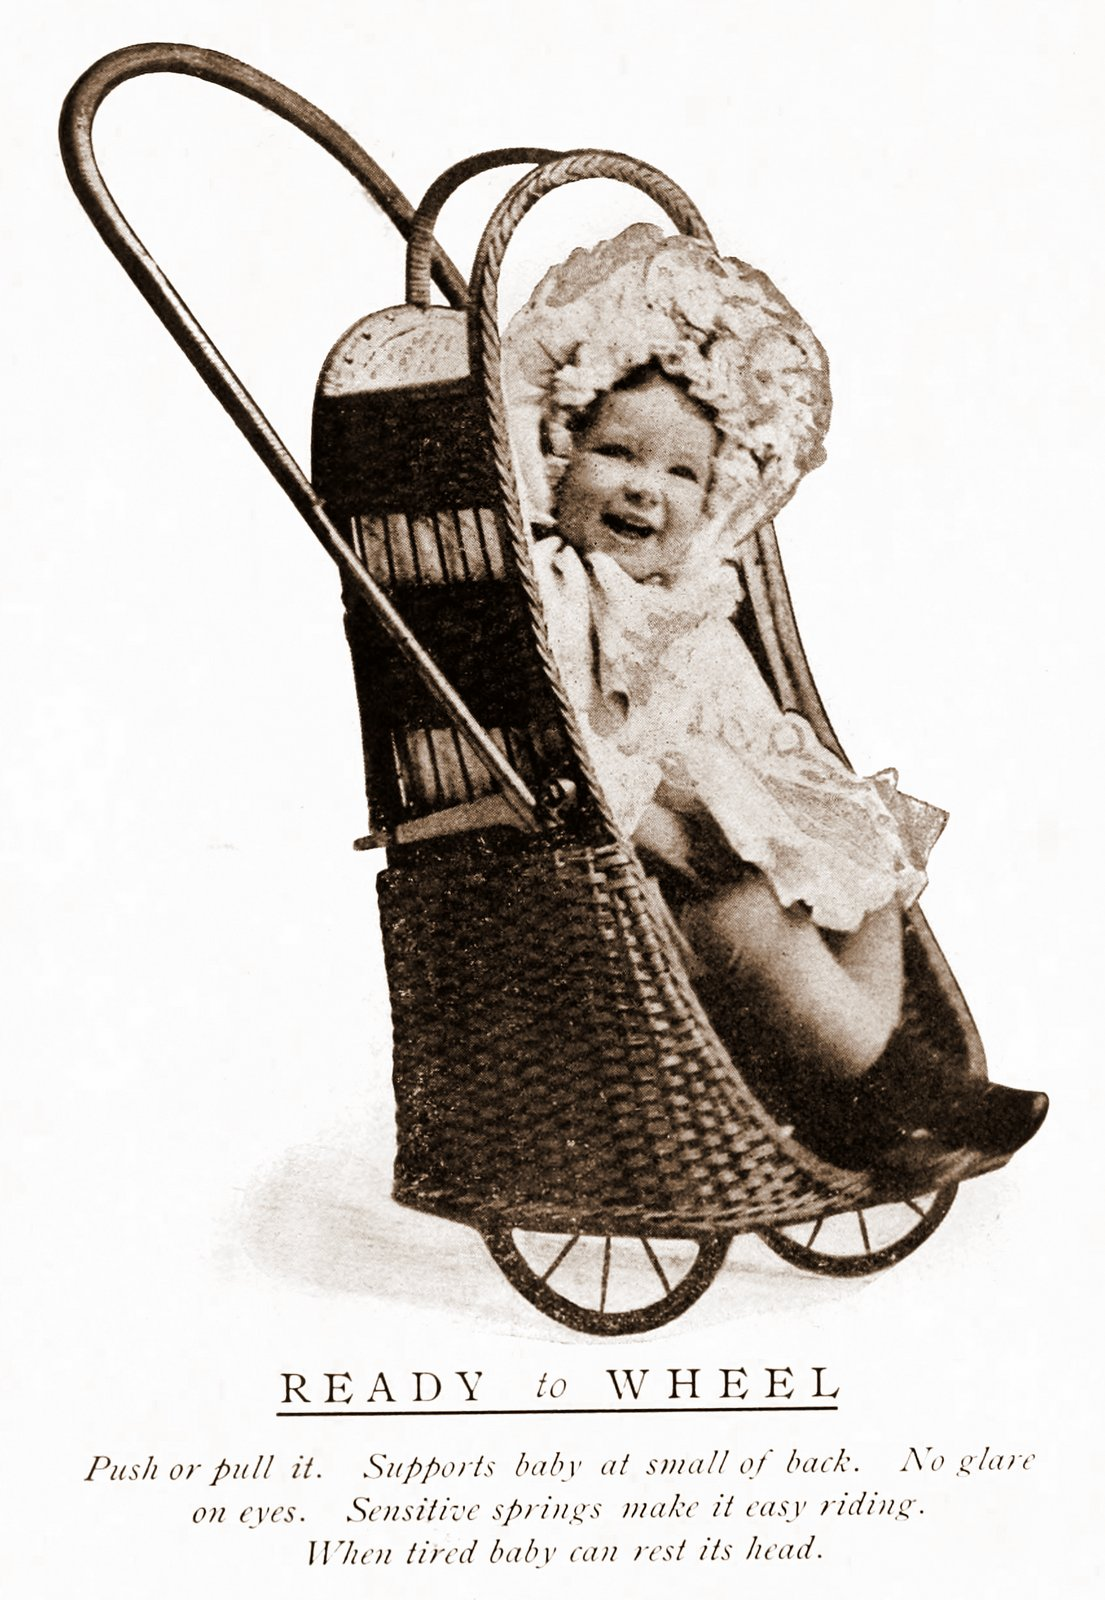 The Oriole Go Basket baby stroller-pram (1907)